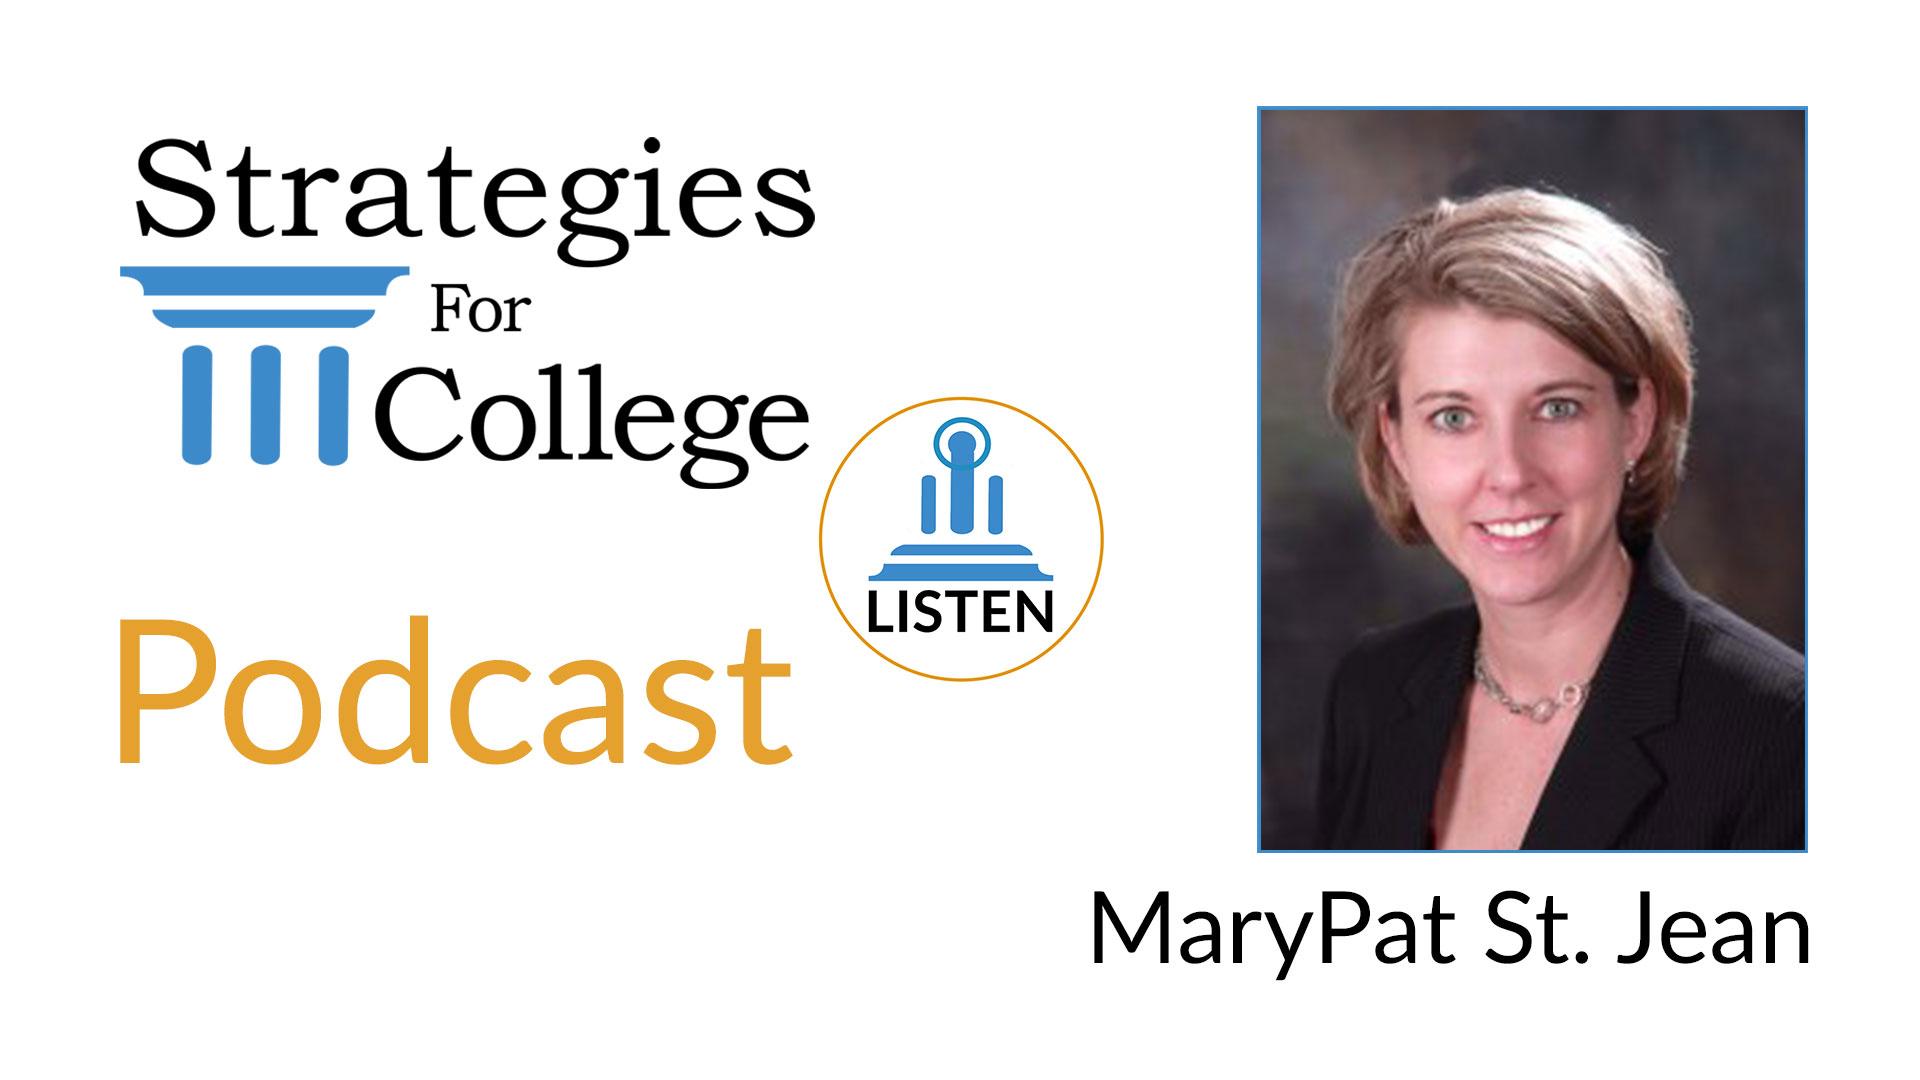 Podcast: MaryPat St. Jean